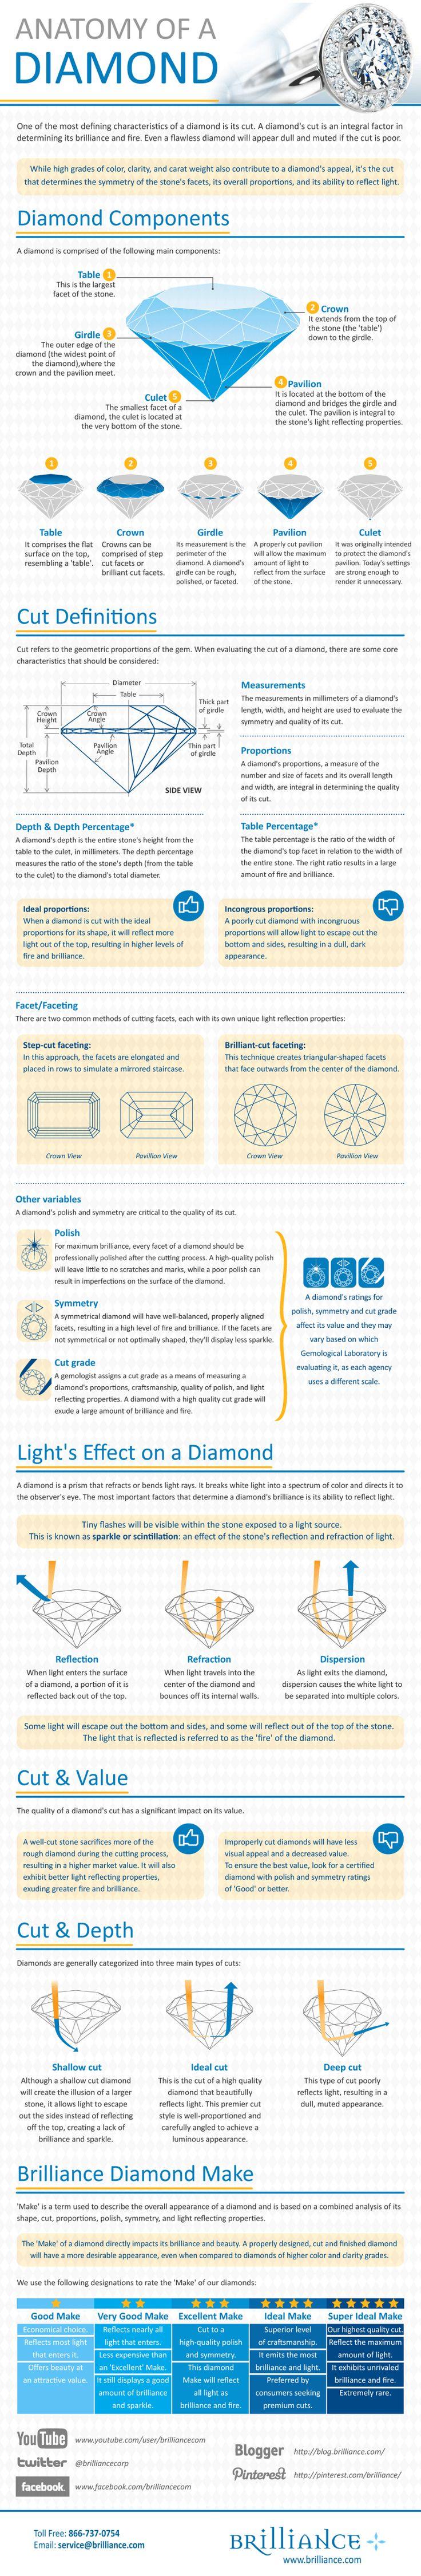 Diamond Cut, Clarity and Color Grade Guide